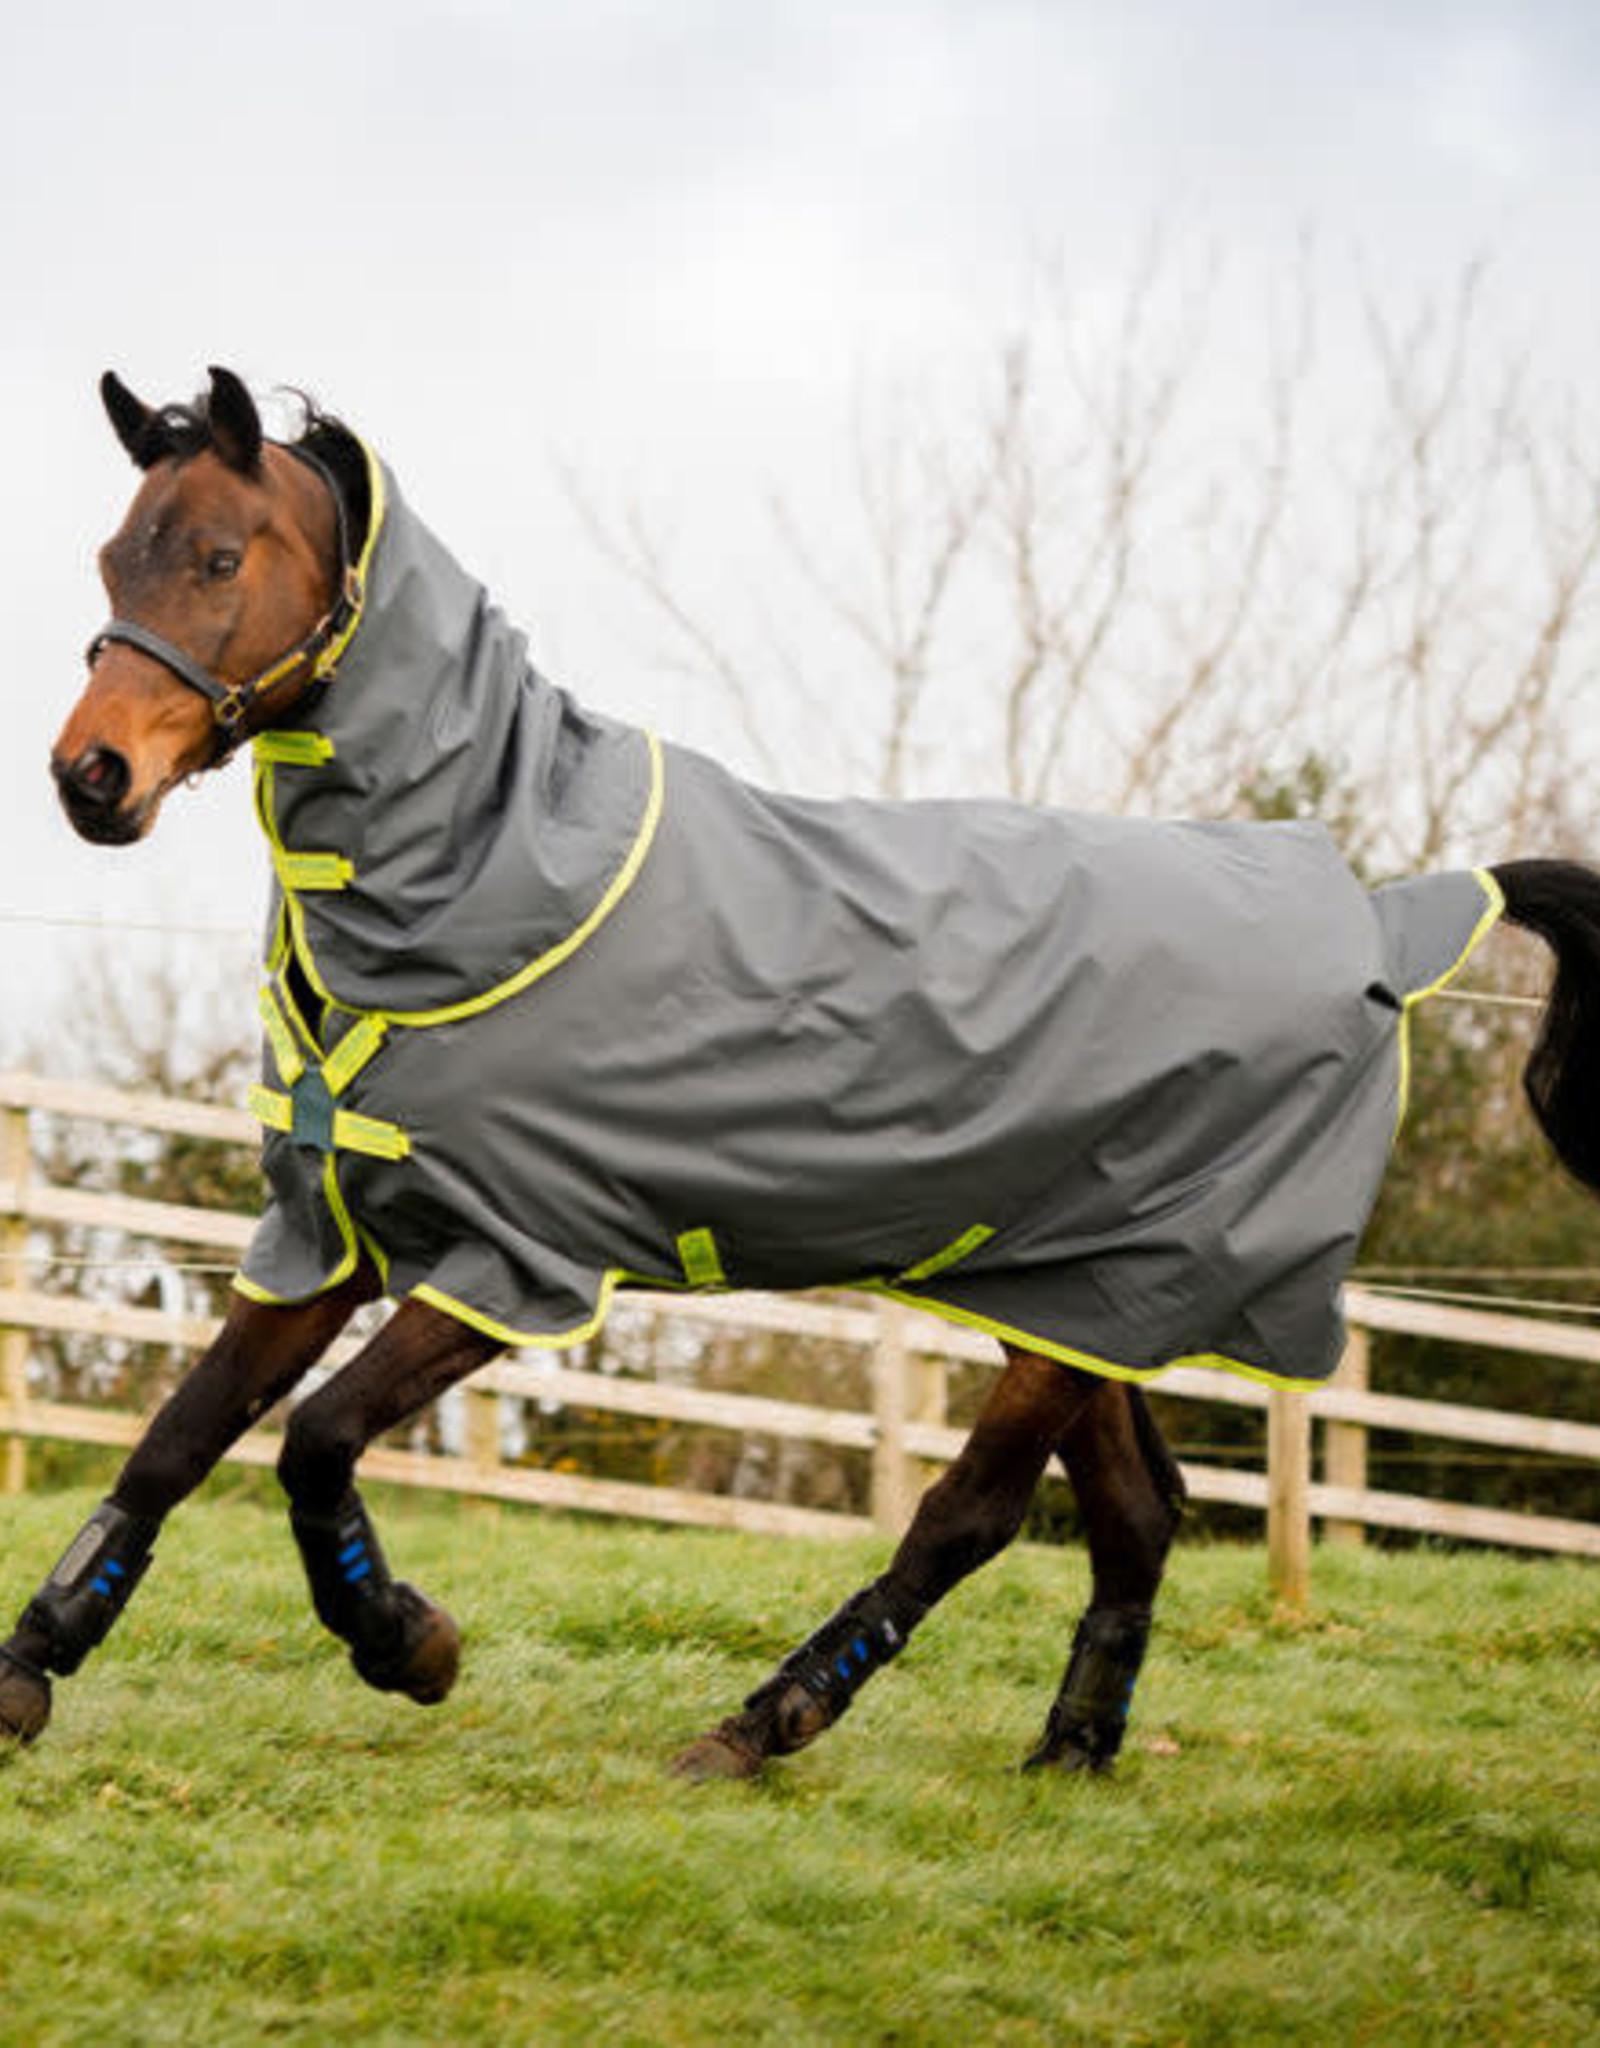 HORSEWARE IRELAND AMIGO HERO 900 PLUS TURNOUT – Disc Front Closure (100g Lite)